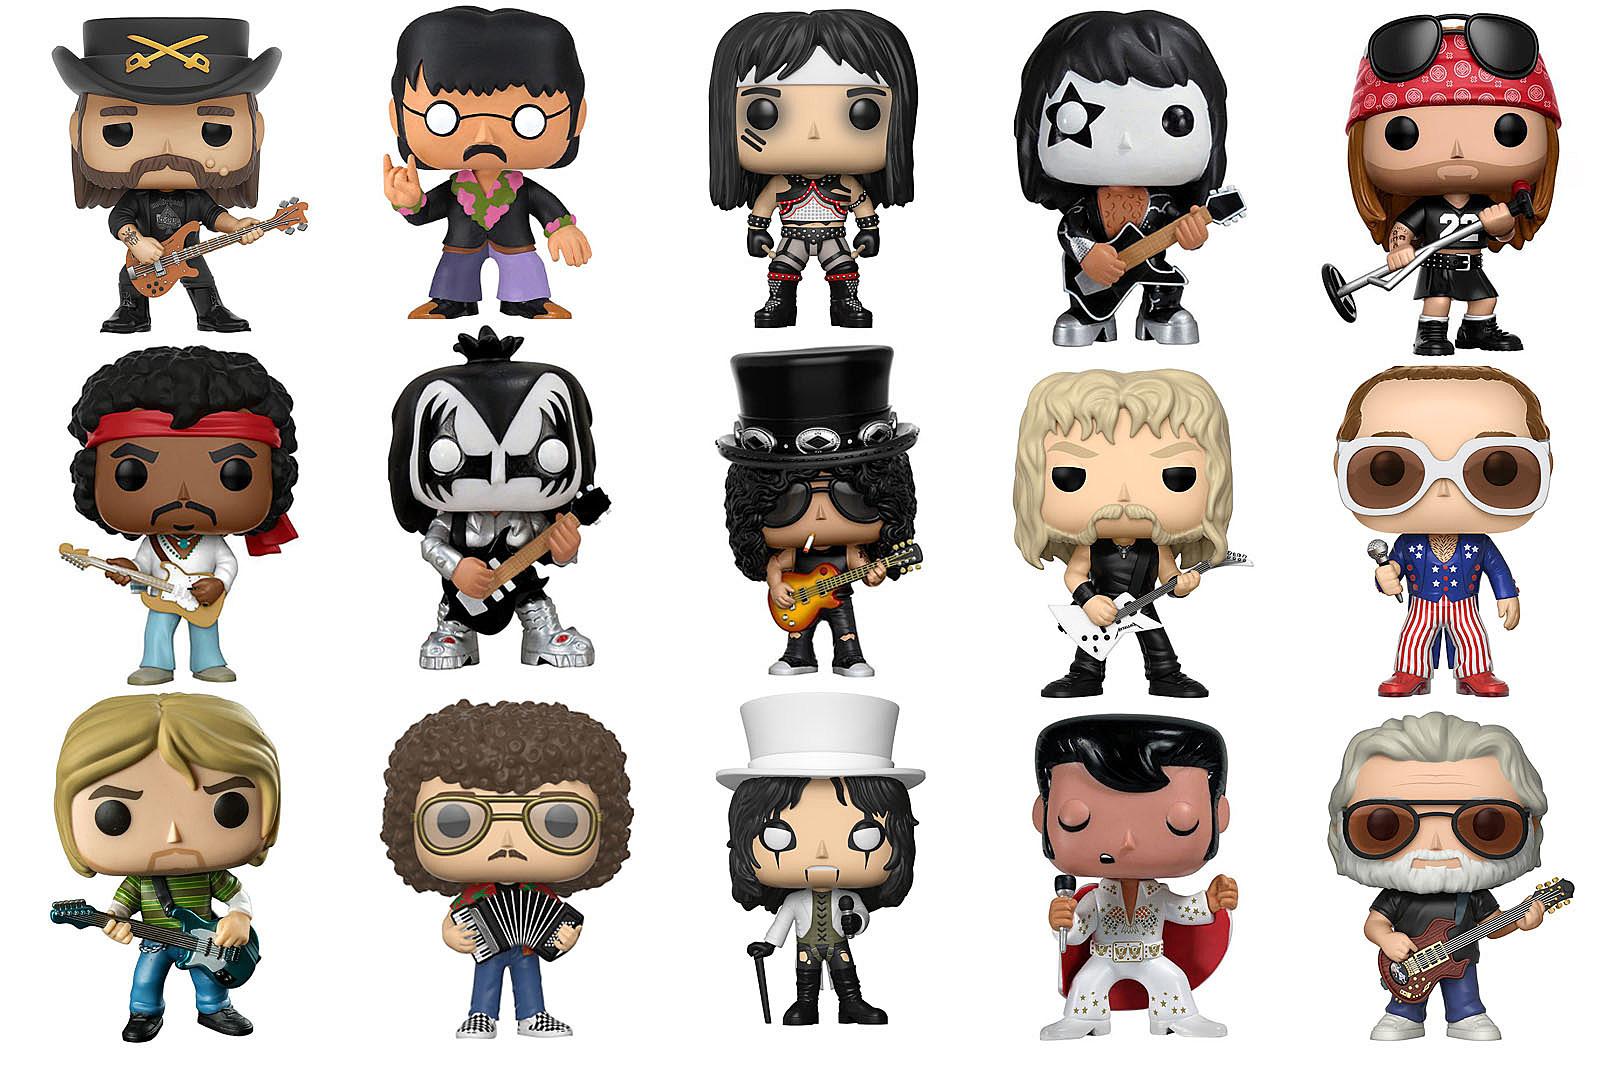 Funko Pop! Rock Star Figures: A Complete Guide